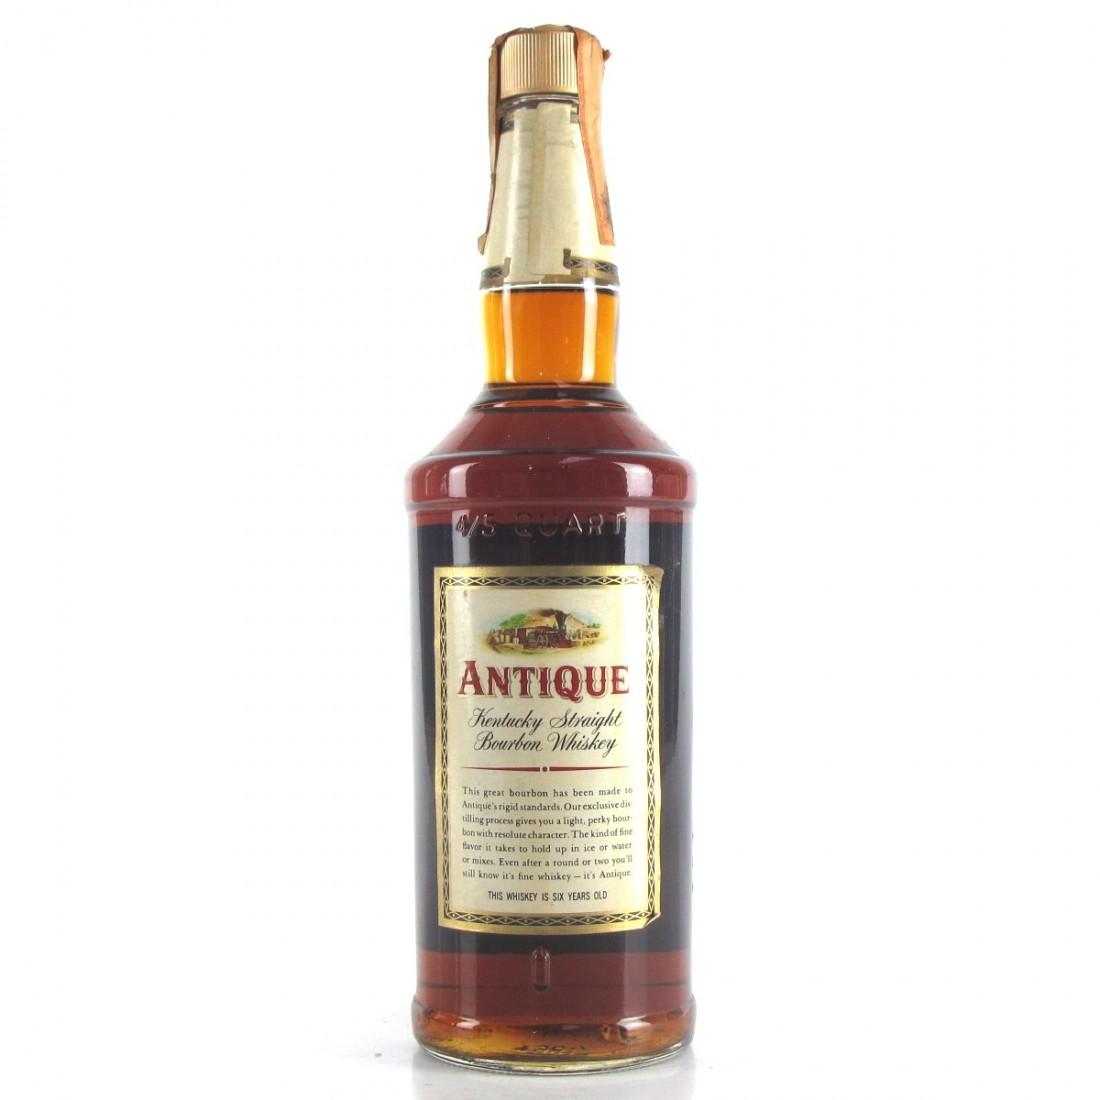 Antique 6 Year Old Kentucky Bourbon 1960s